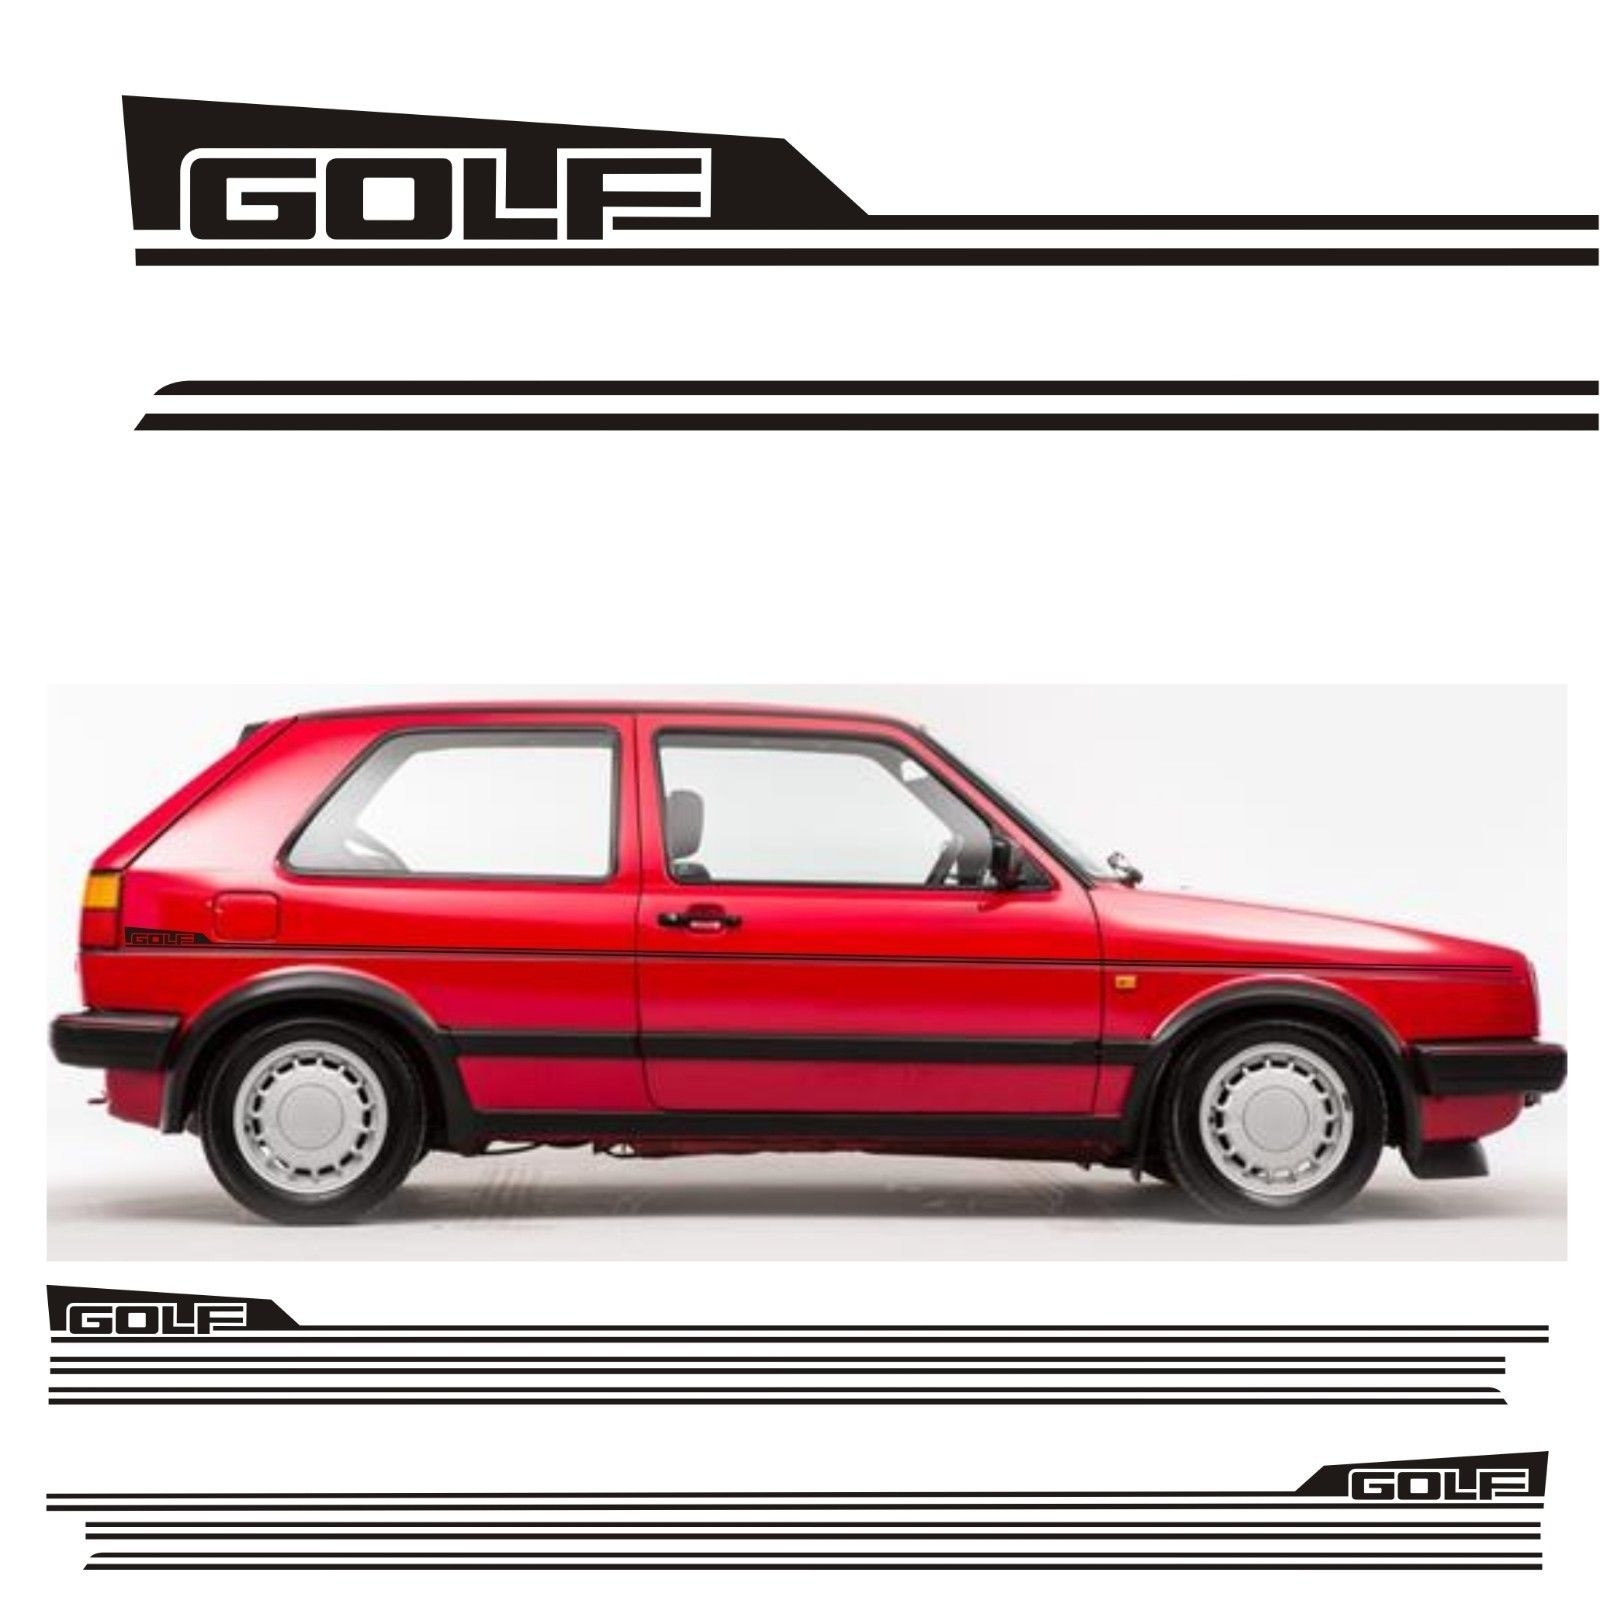 Neu Blinker rauch Links oder rechts VW Jetta 2 II Blinkleuchte 19E 1984-1991